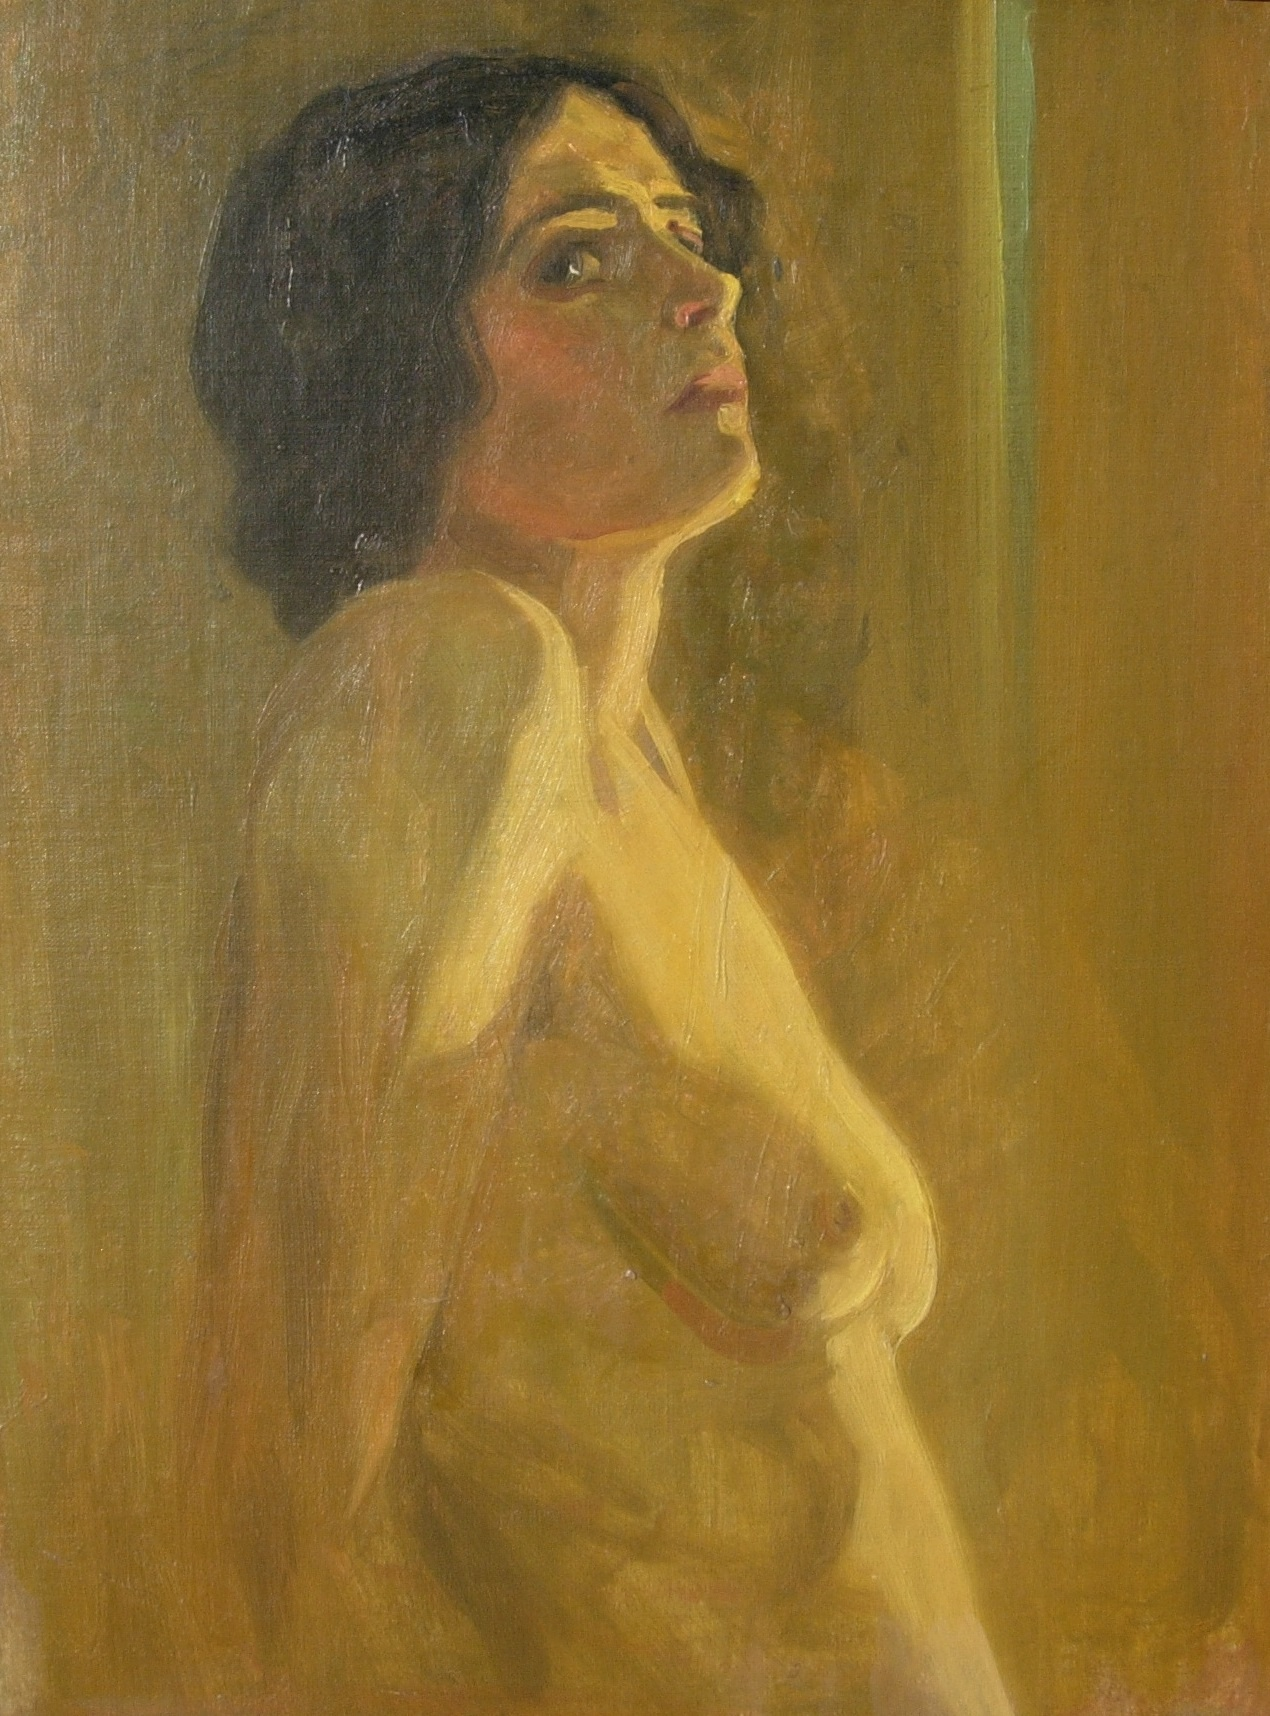 griffith-nudefemaletorso-cropped